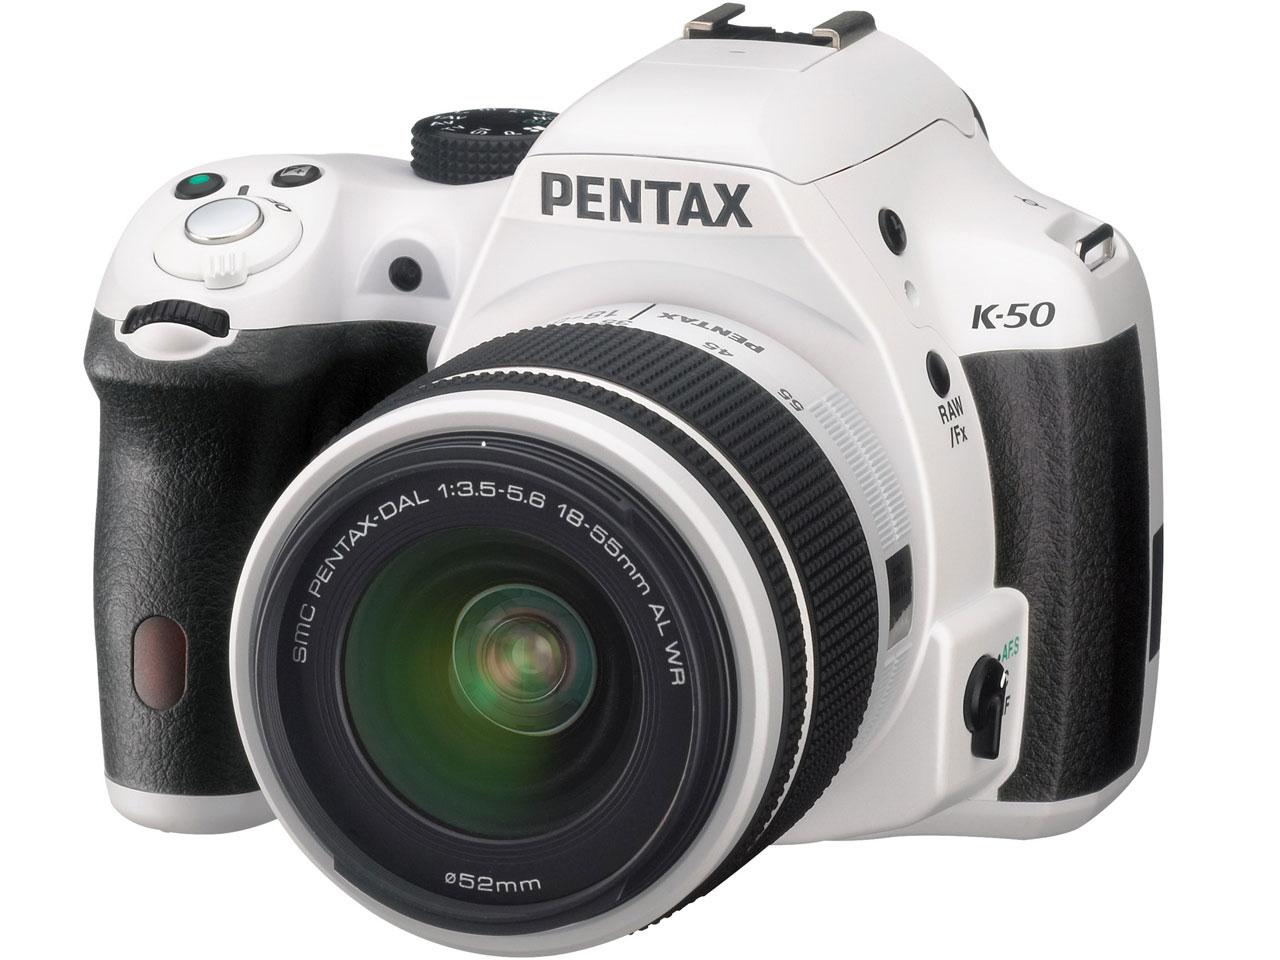 PENTAX K-50 ダブルズームキット の製品画像